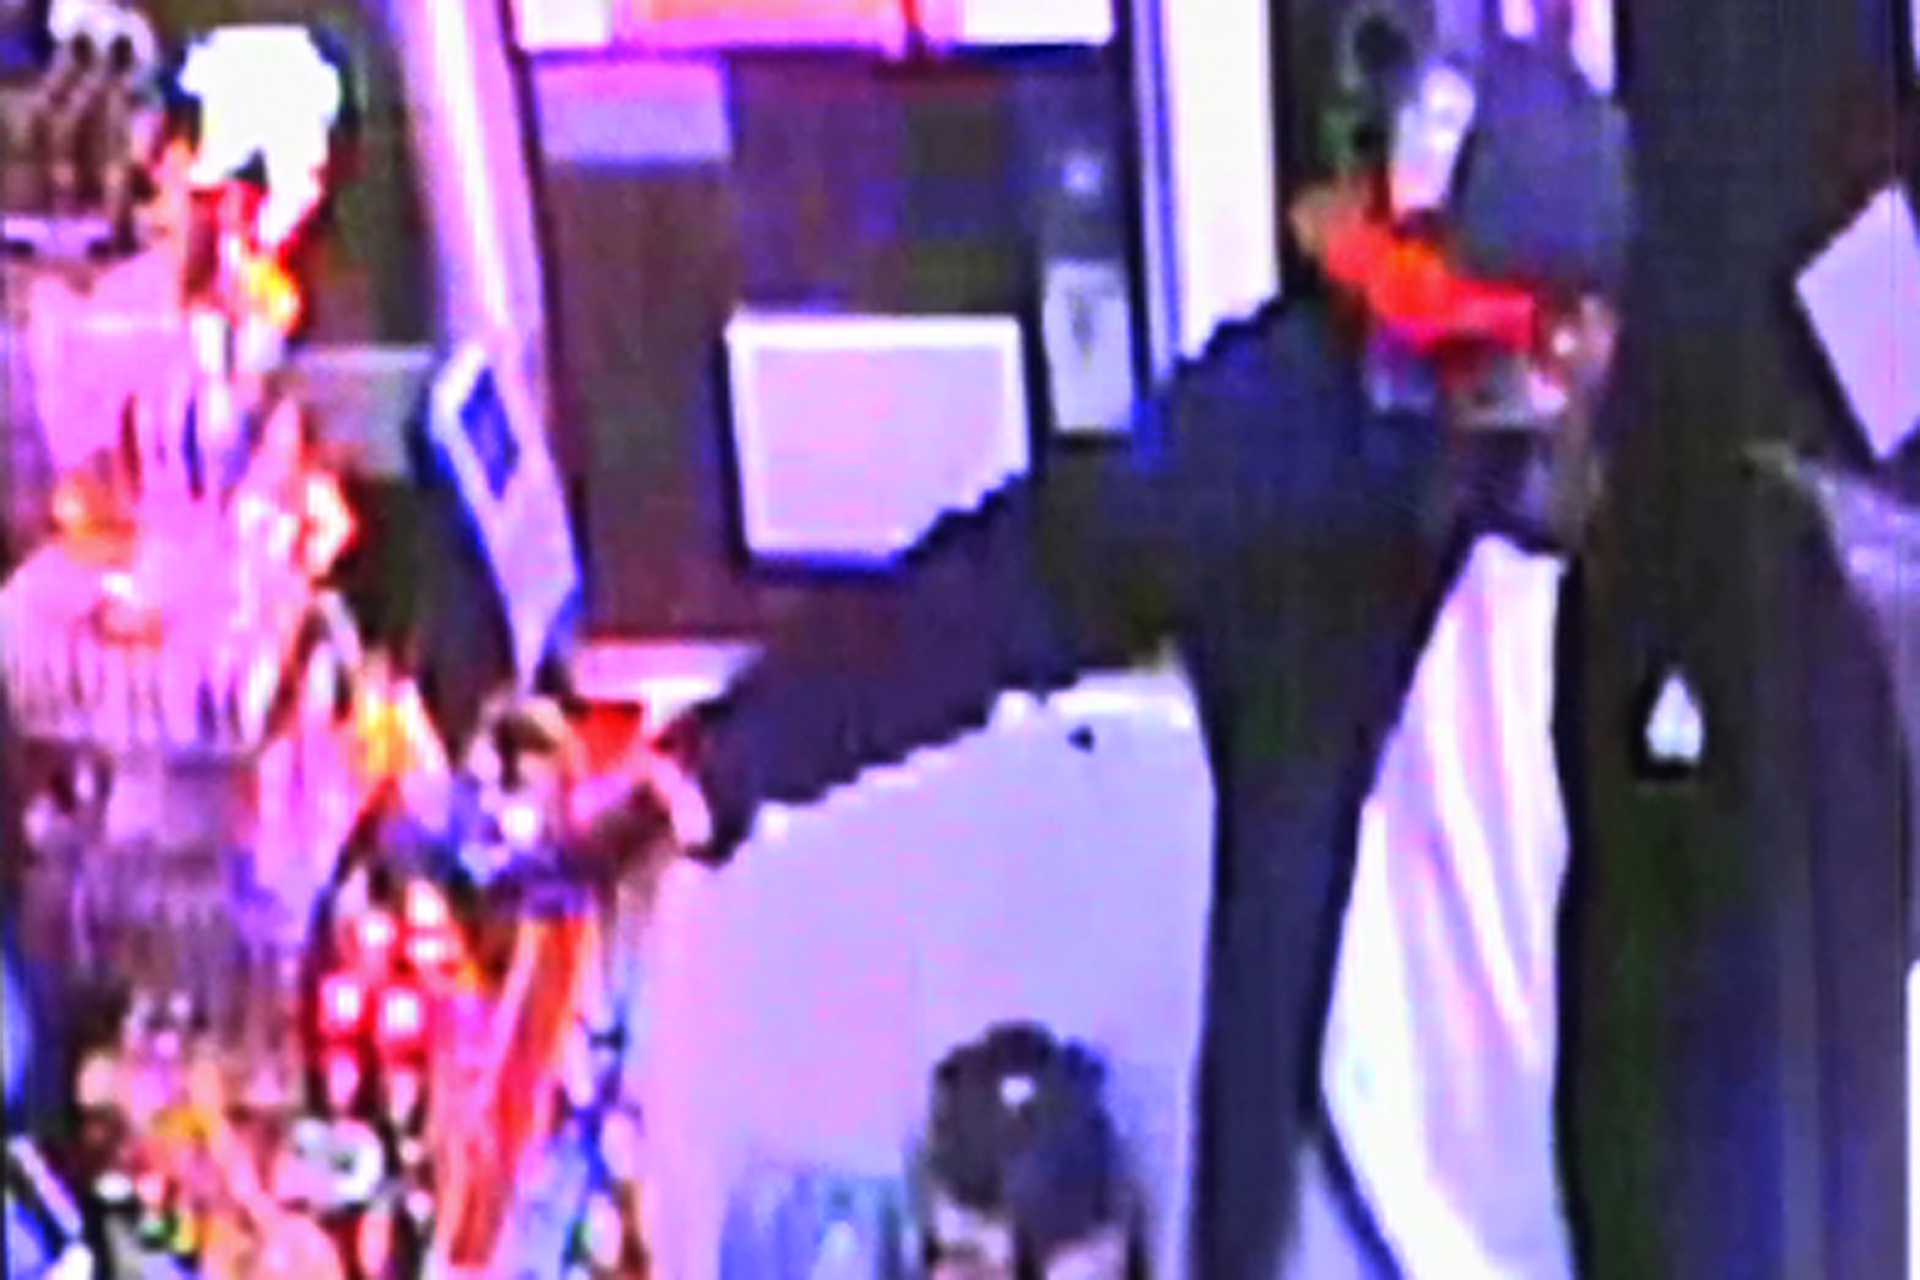 A surveillance image shows an armed robber inside a Huntington Beach Arco food mart on April 1, 2019. (Credit: OnScene.TV)